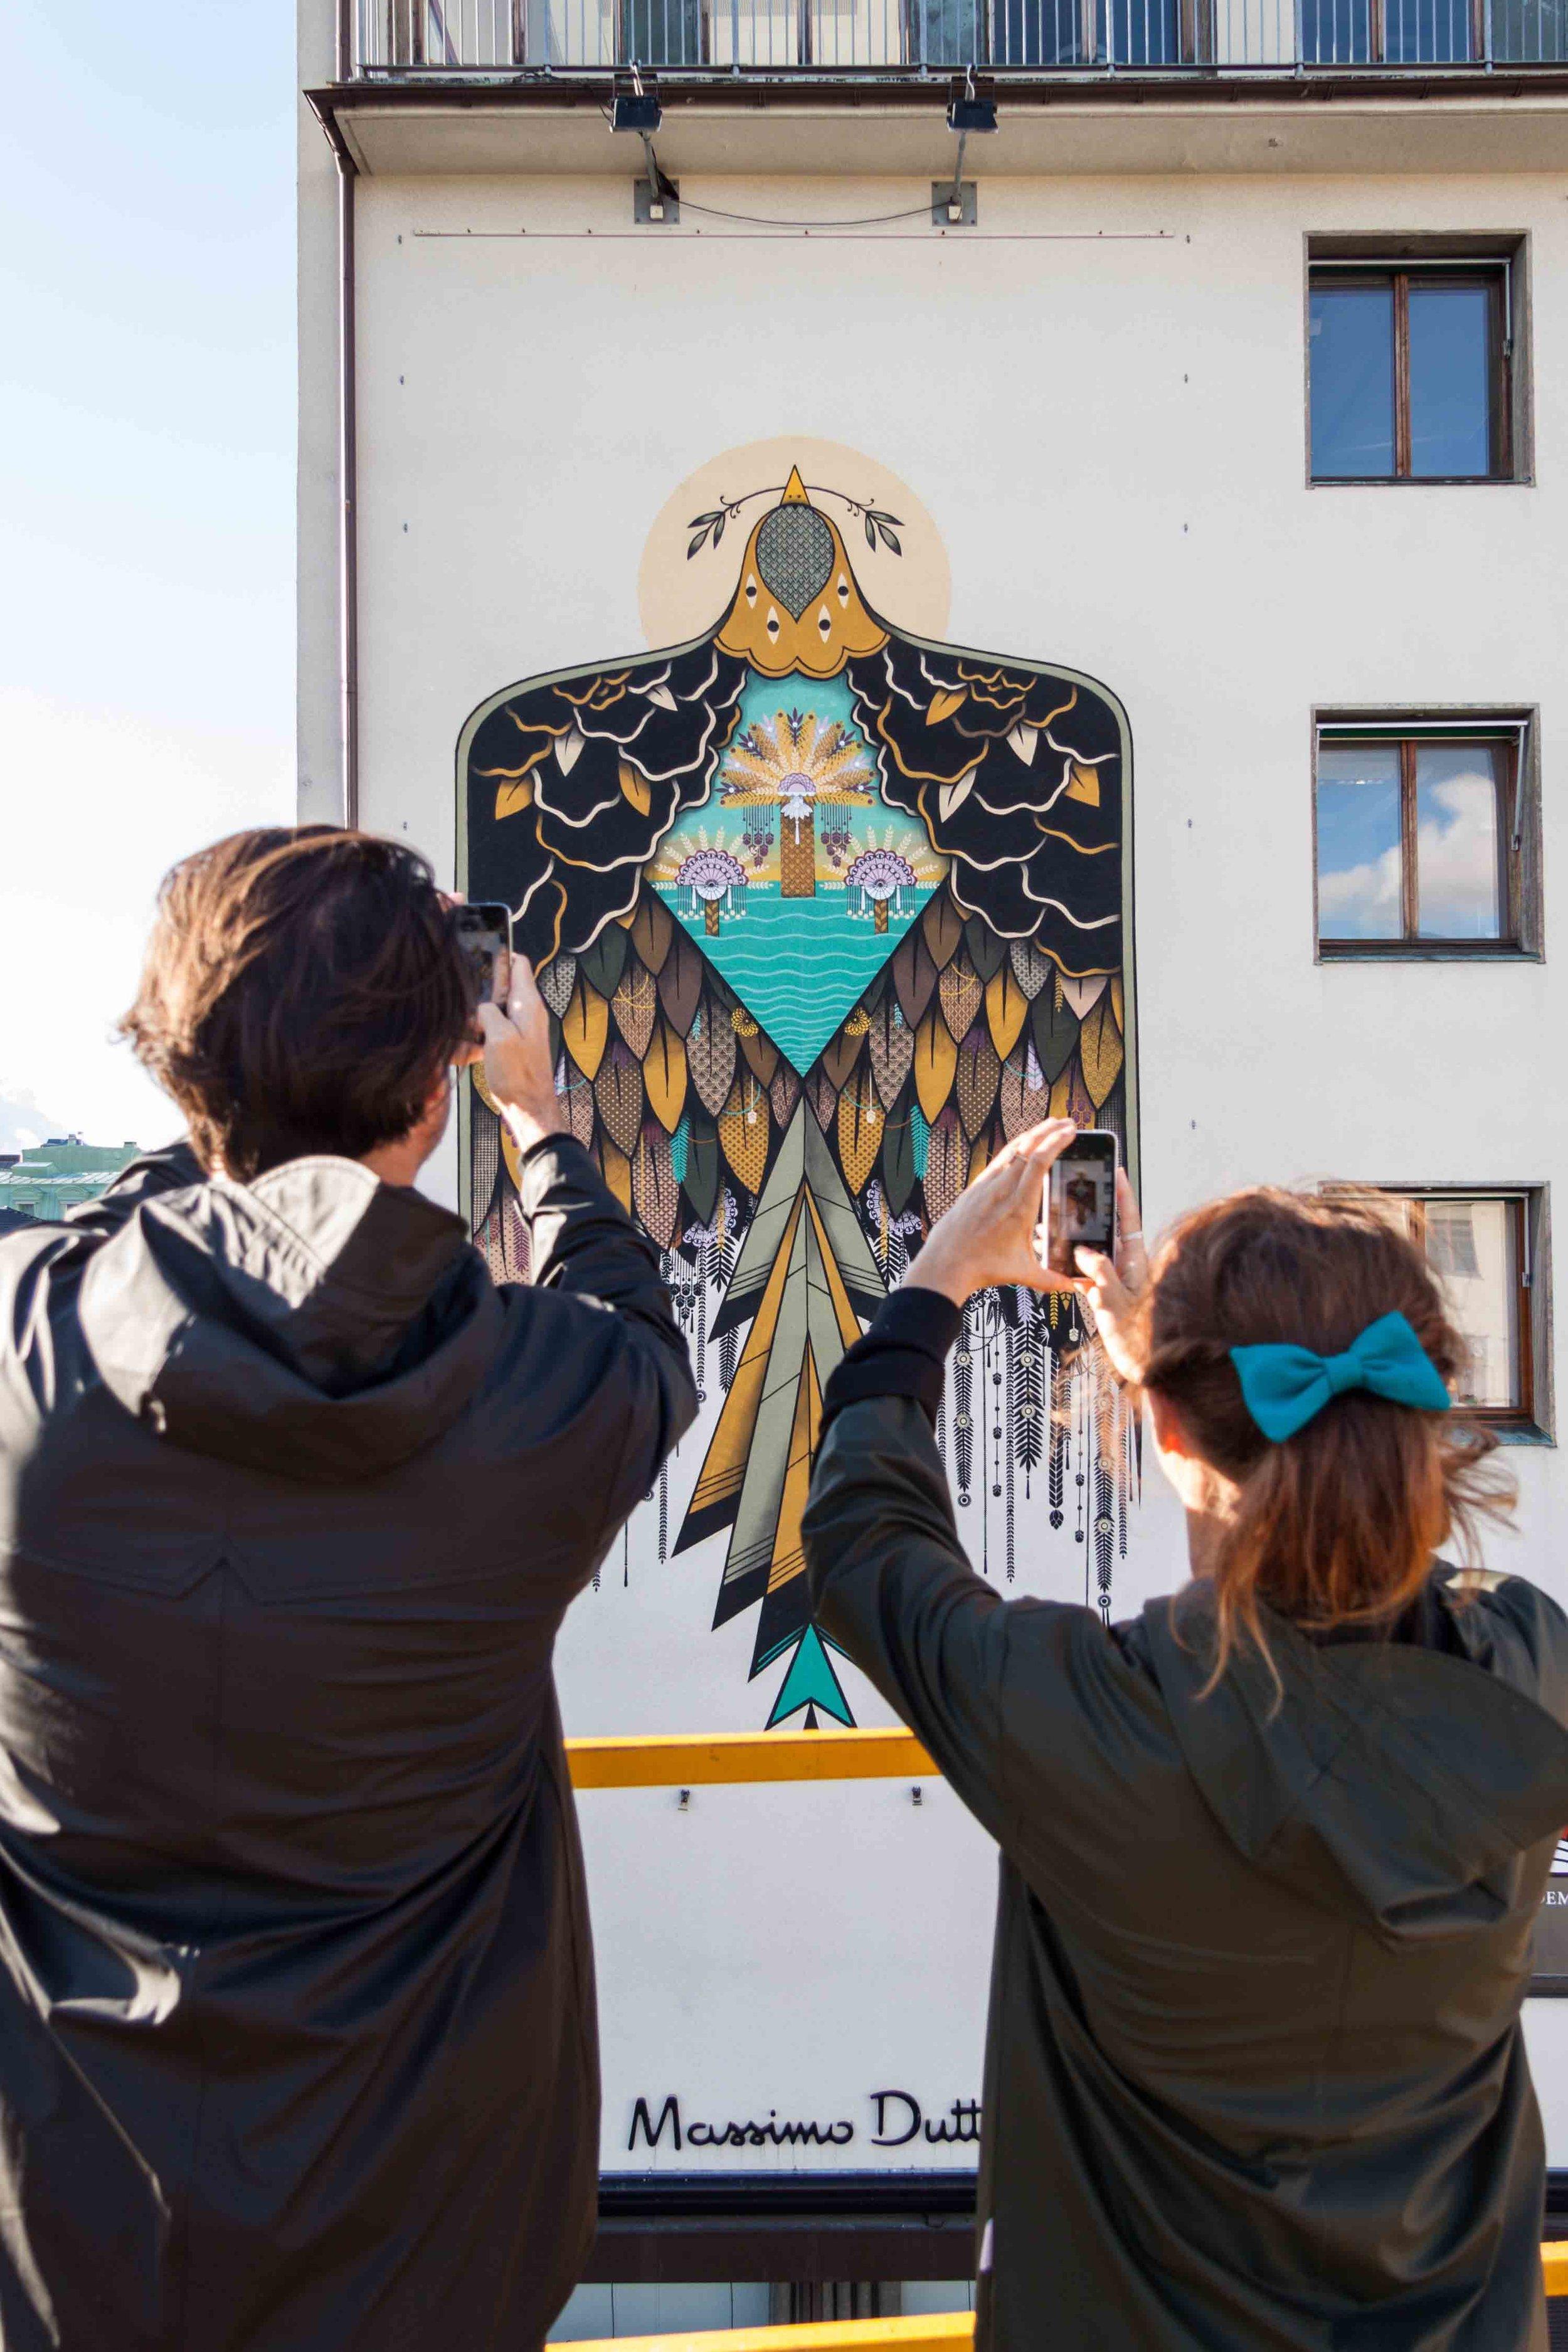 KORALIE&SUPAKITSCH_Artscape_2016-08-10_FredrikÅkerberg_2998x4497_39.jpg